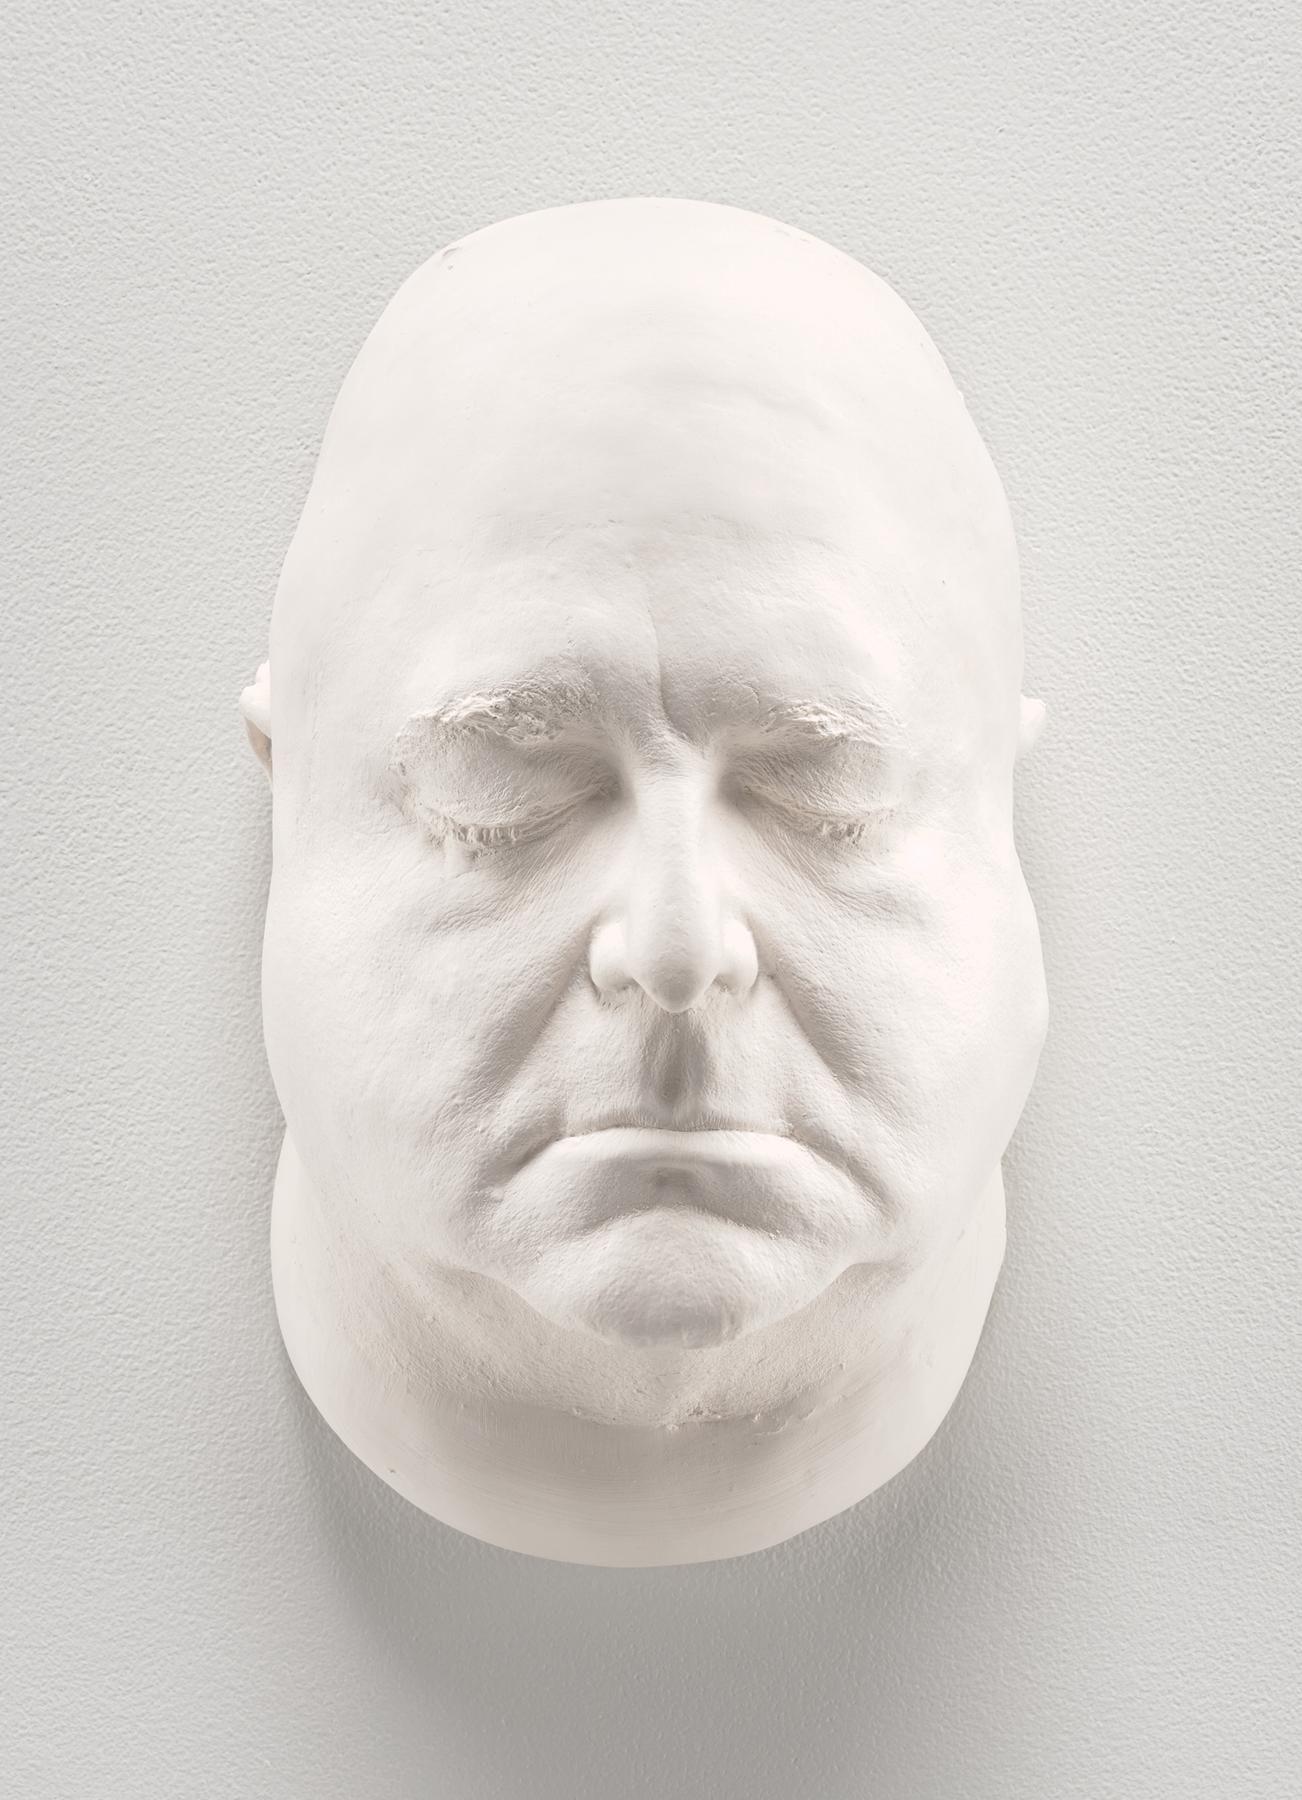 Edmier imagines (John Goodman, Actor)